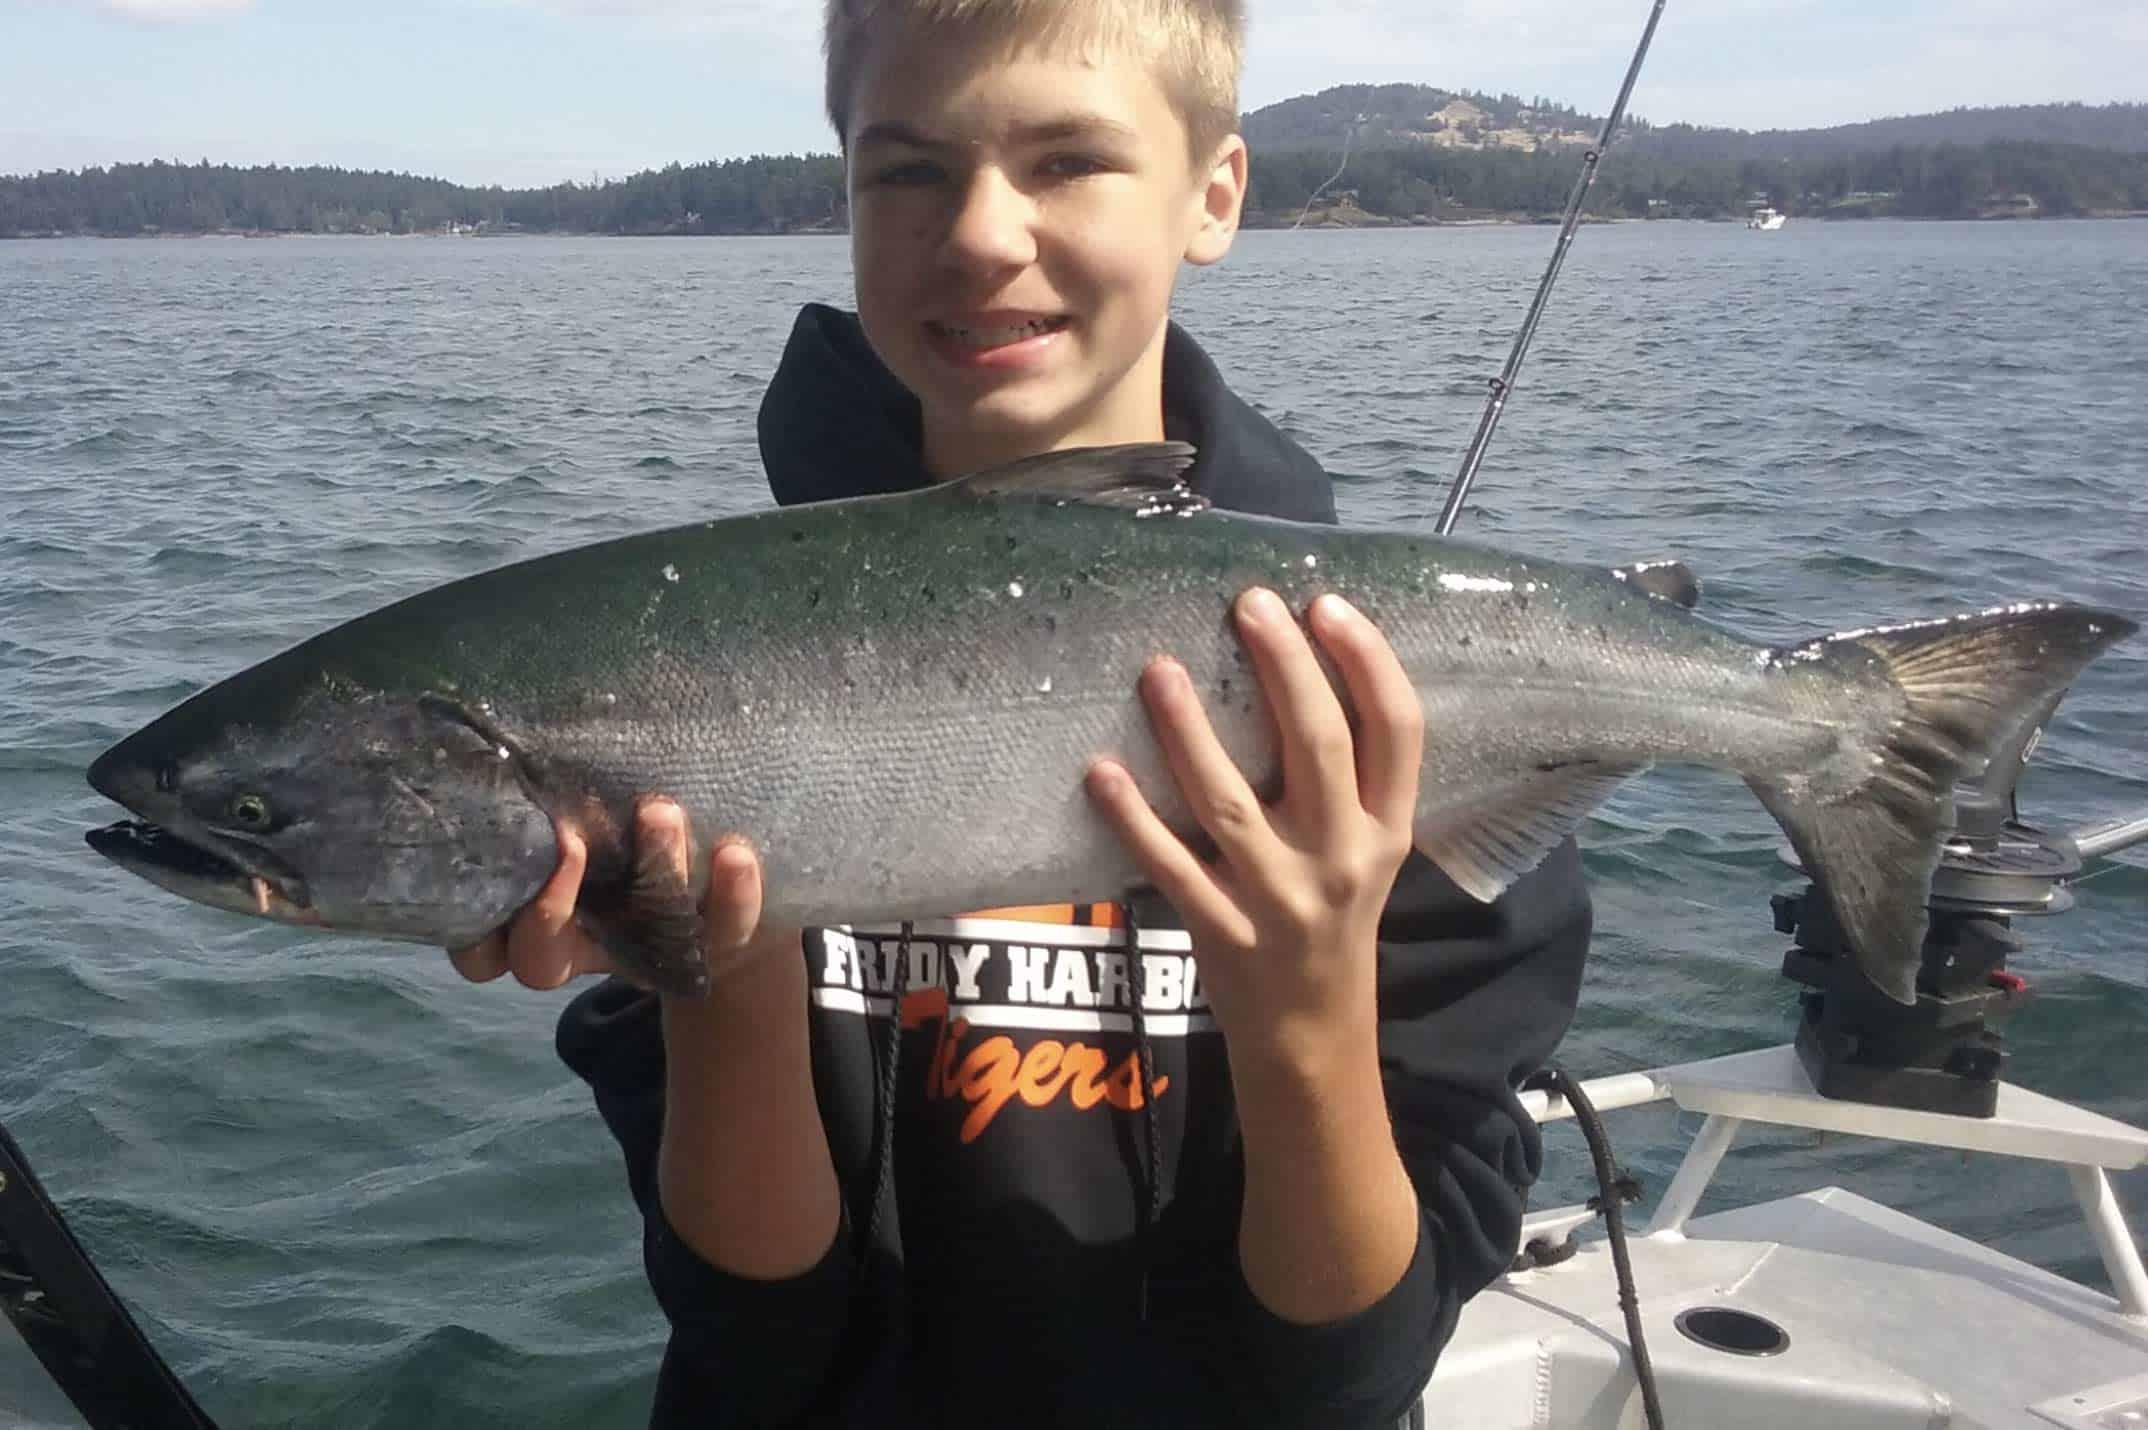 boy catching fish on boat rental